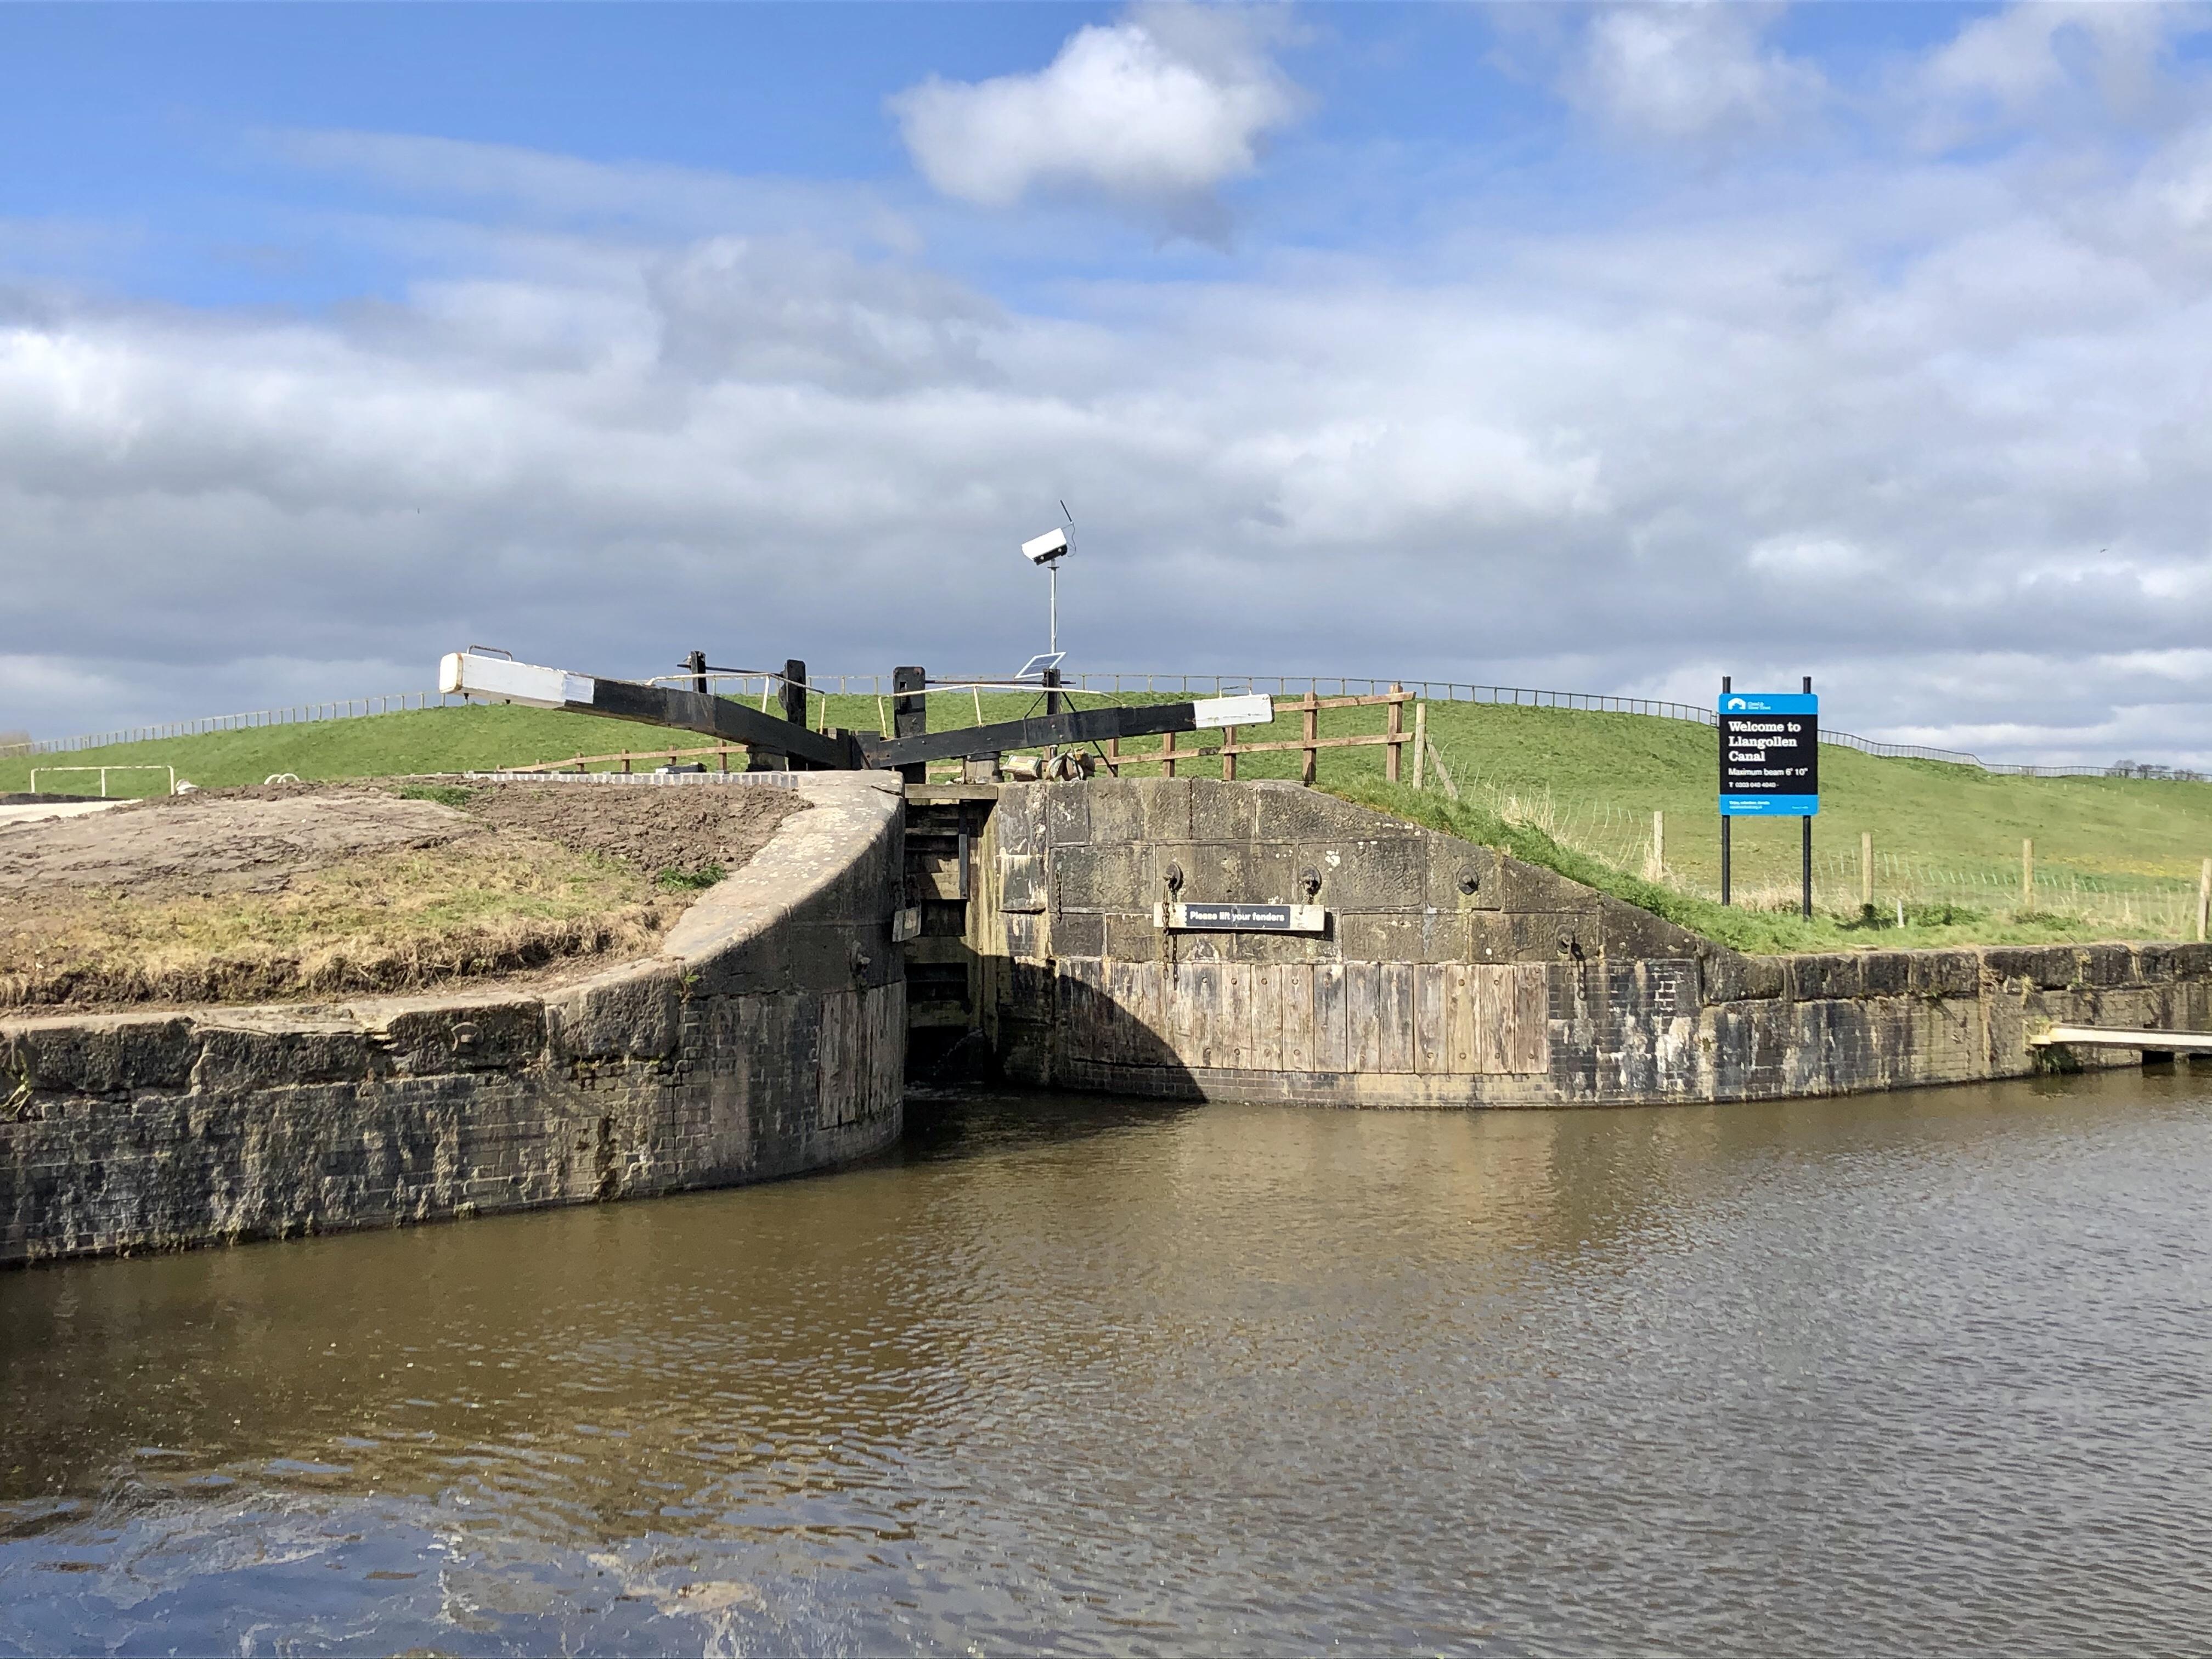 Hurleston Locks 29th March 2020